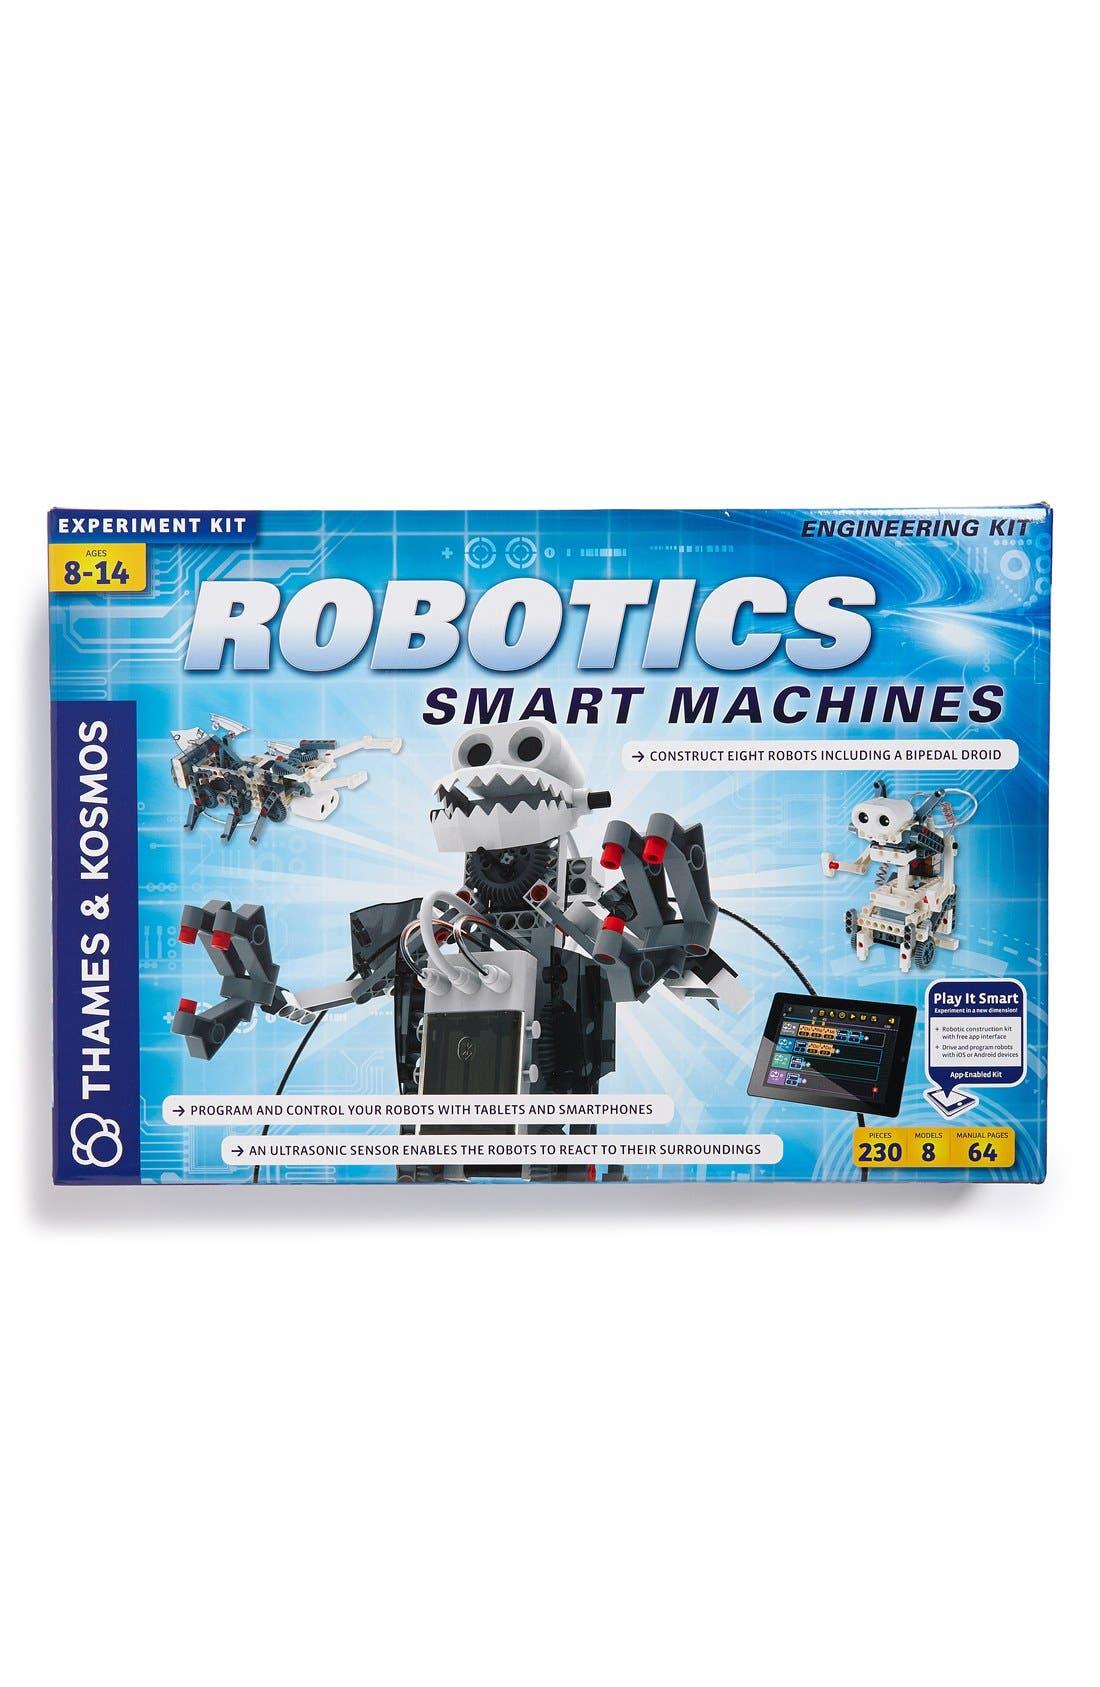 Thames & Kosmos 'Robotics Smart Machines' Kit